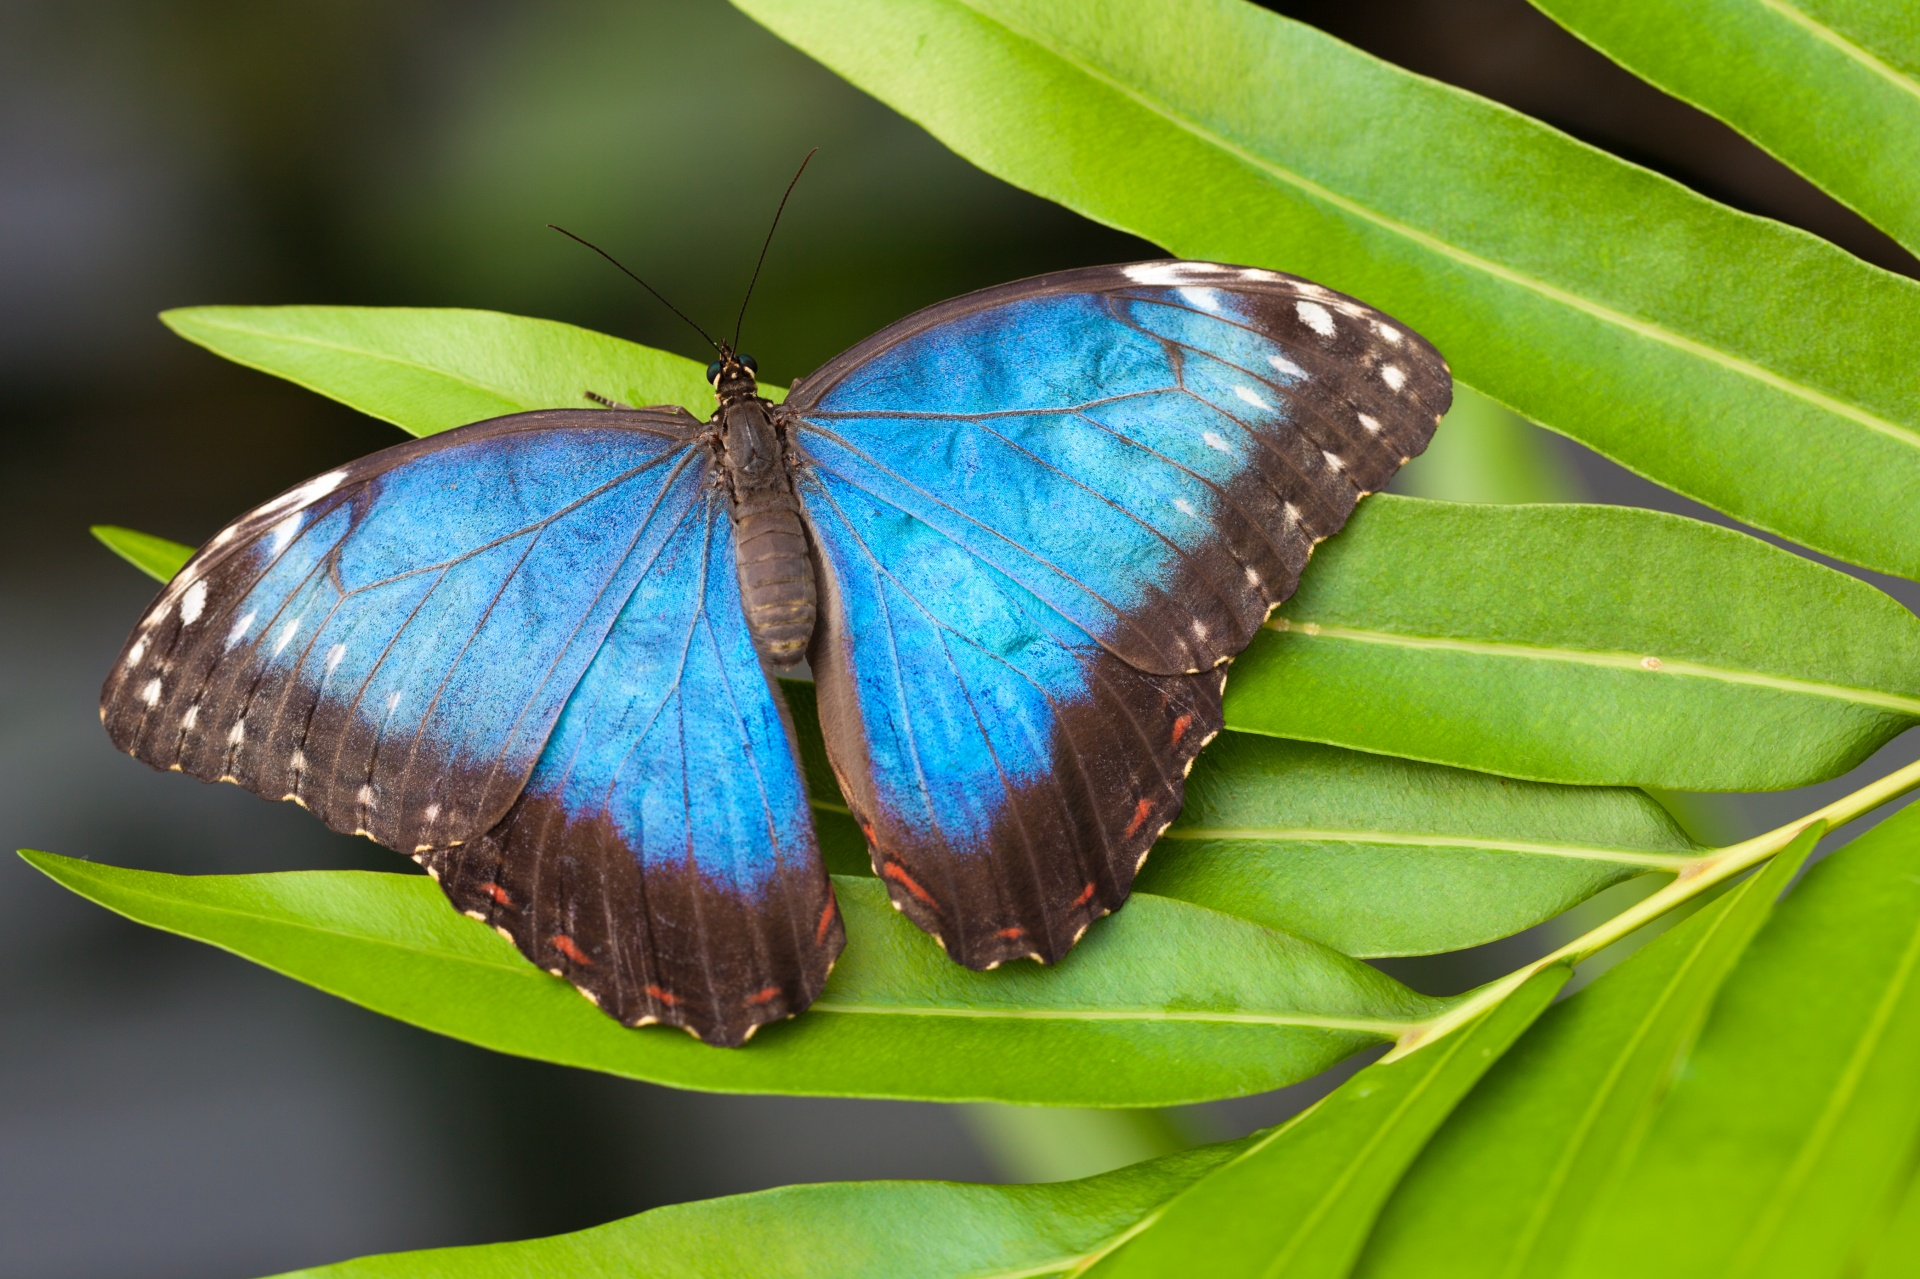 morpho-butterfly-1452254349NBZ